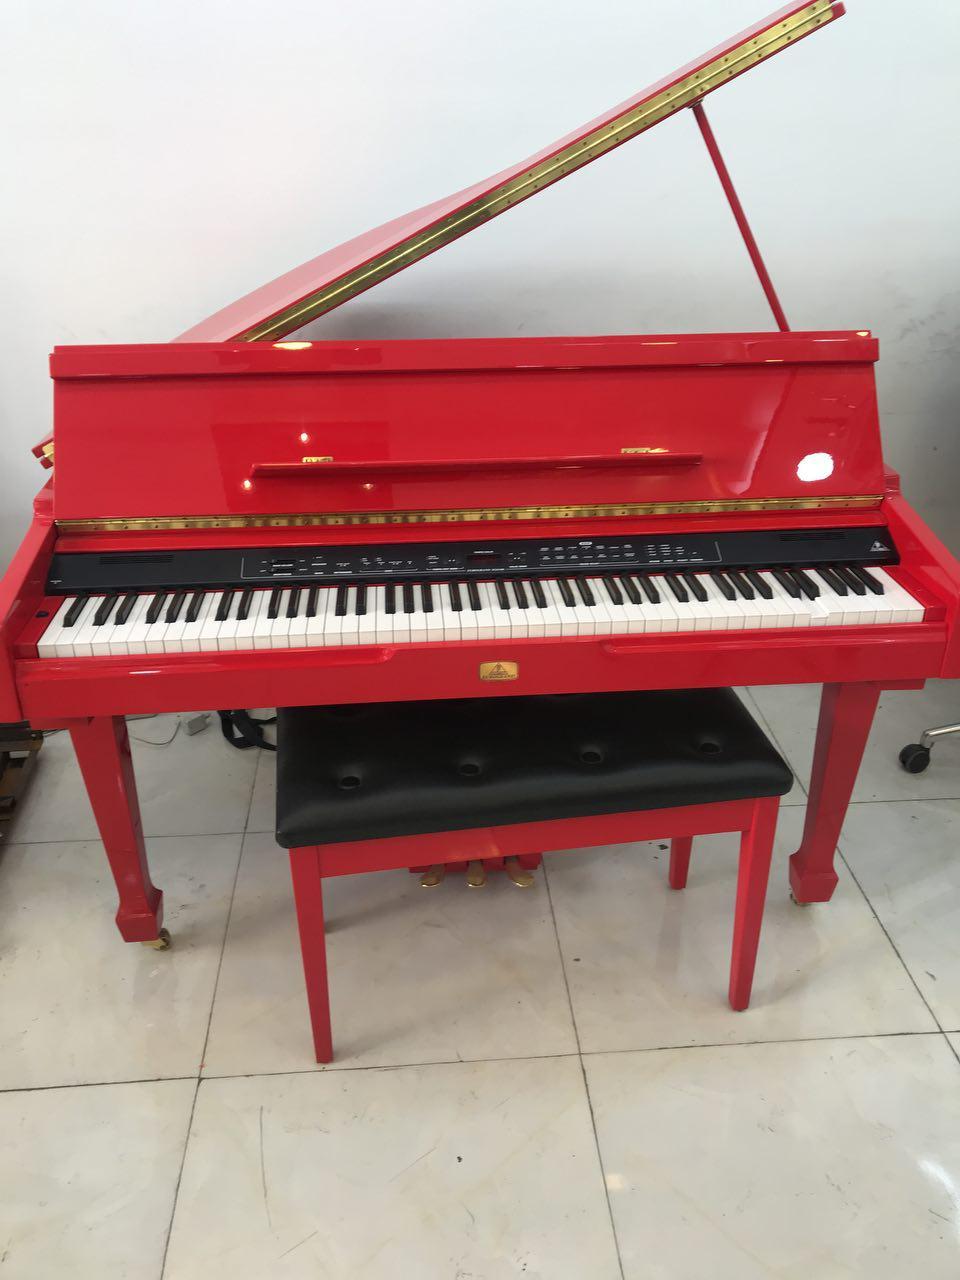 فروش پیانو دیجیتال بهرینگر(نقد و اقساط)